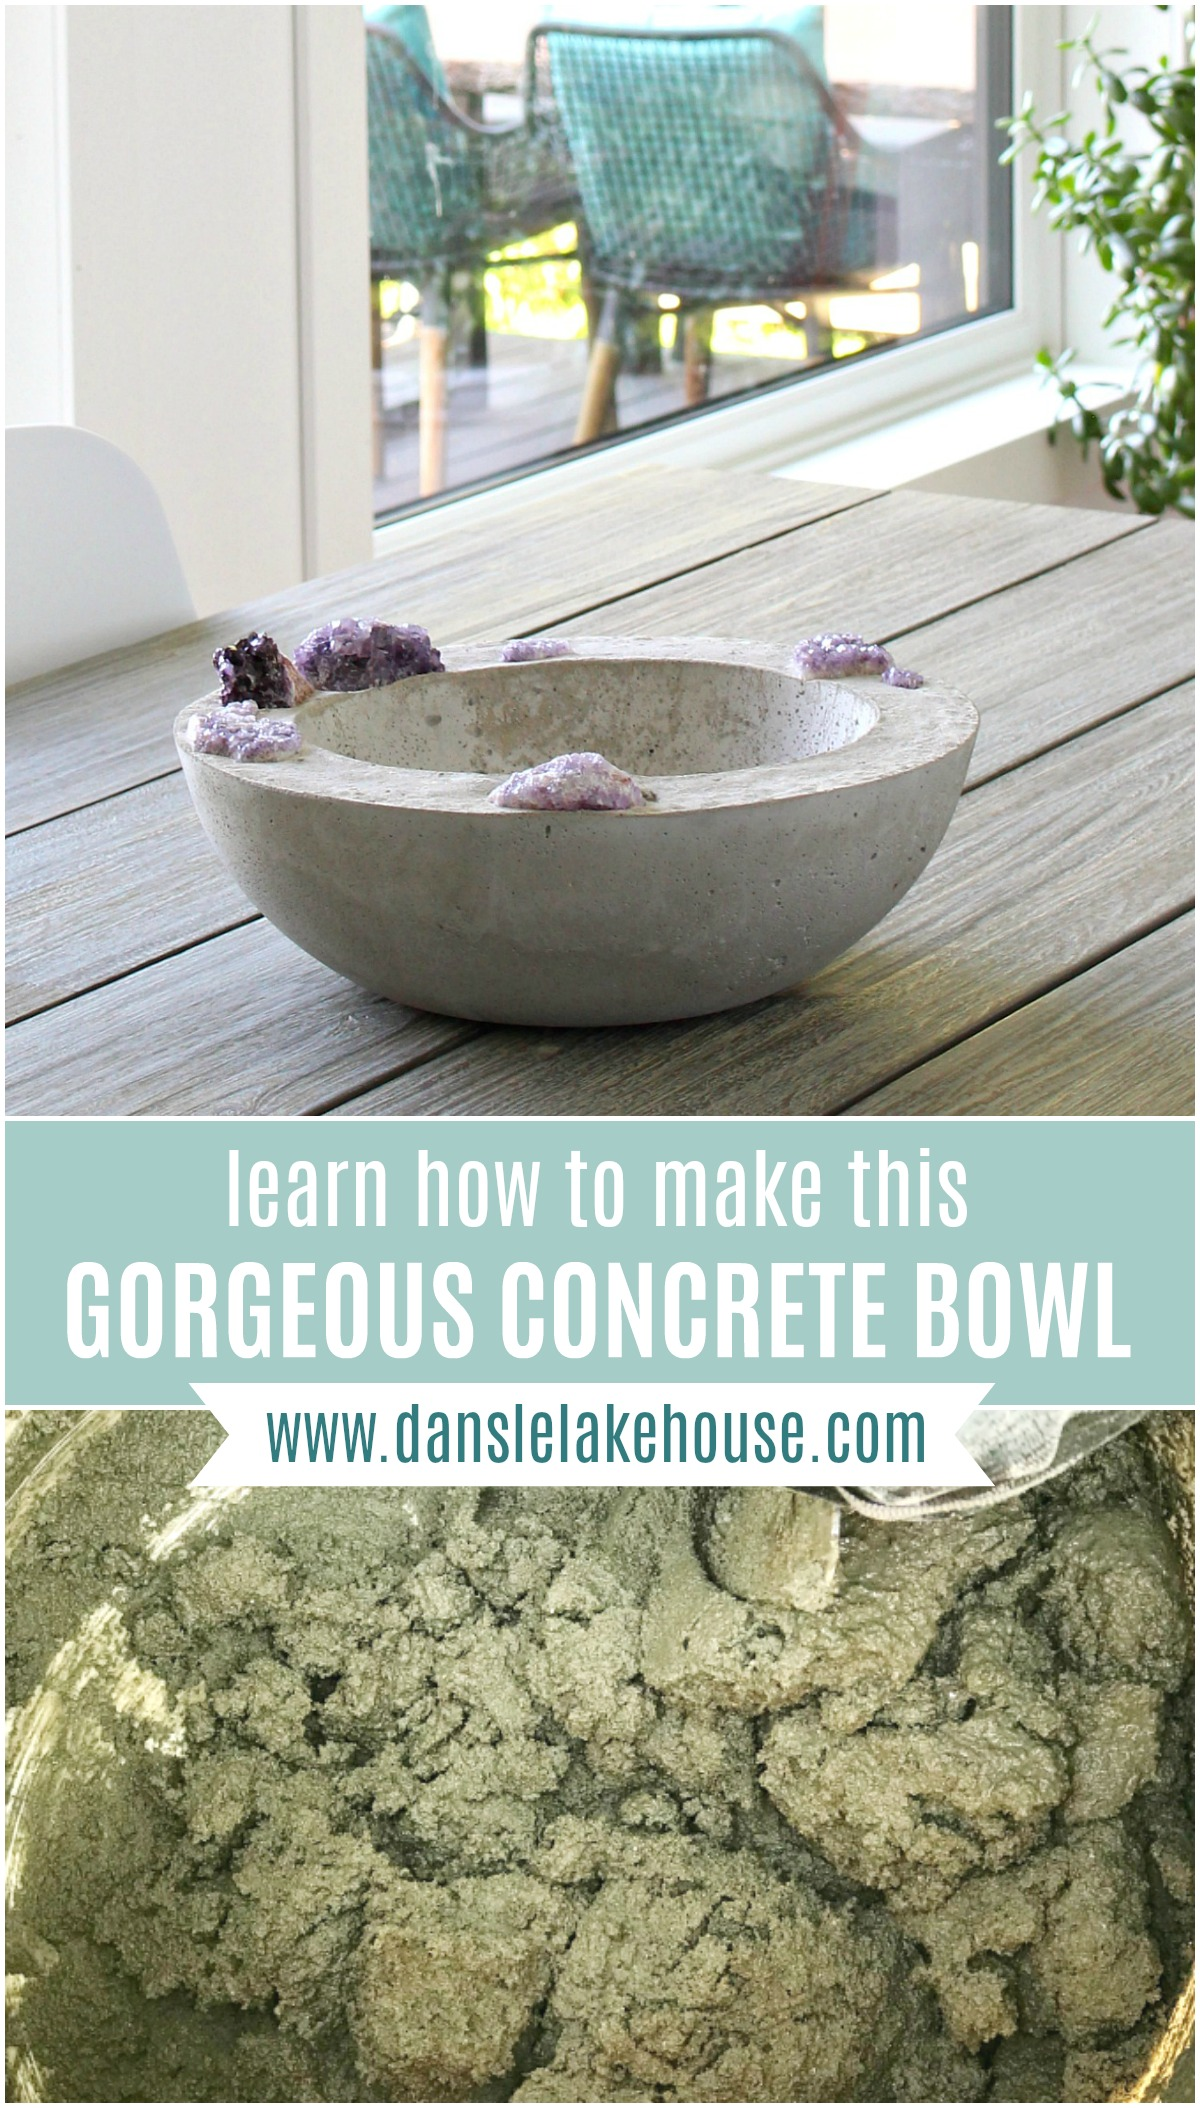 DIY Concrete Bowl with Embedded Amethyst